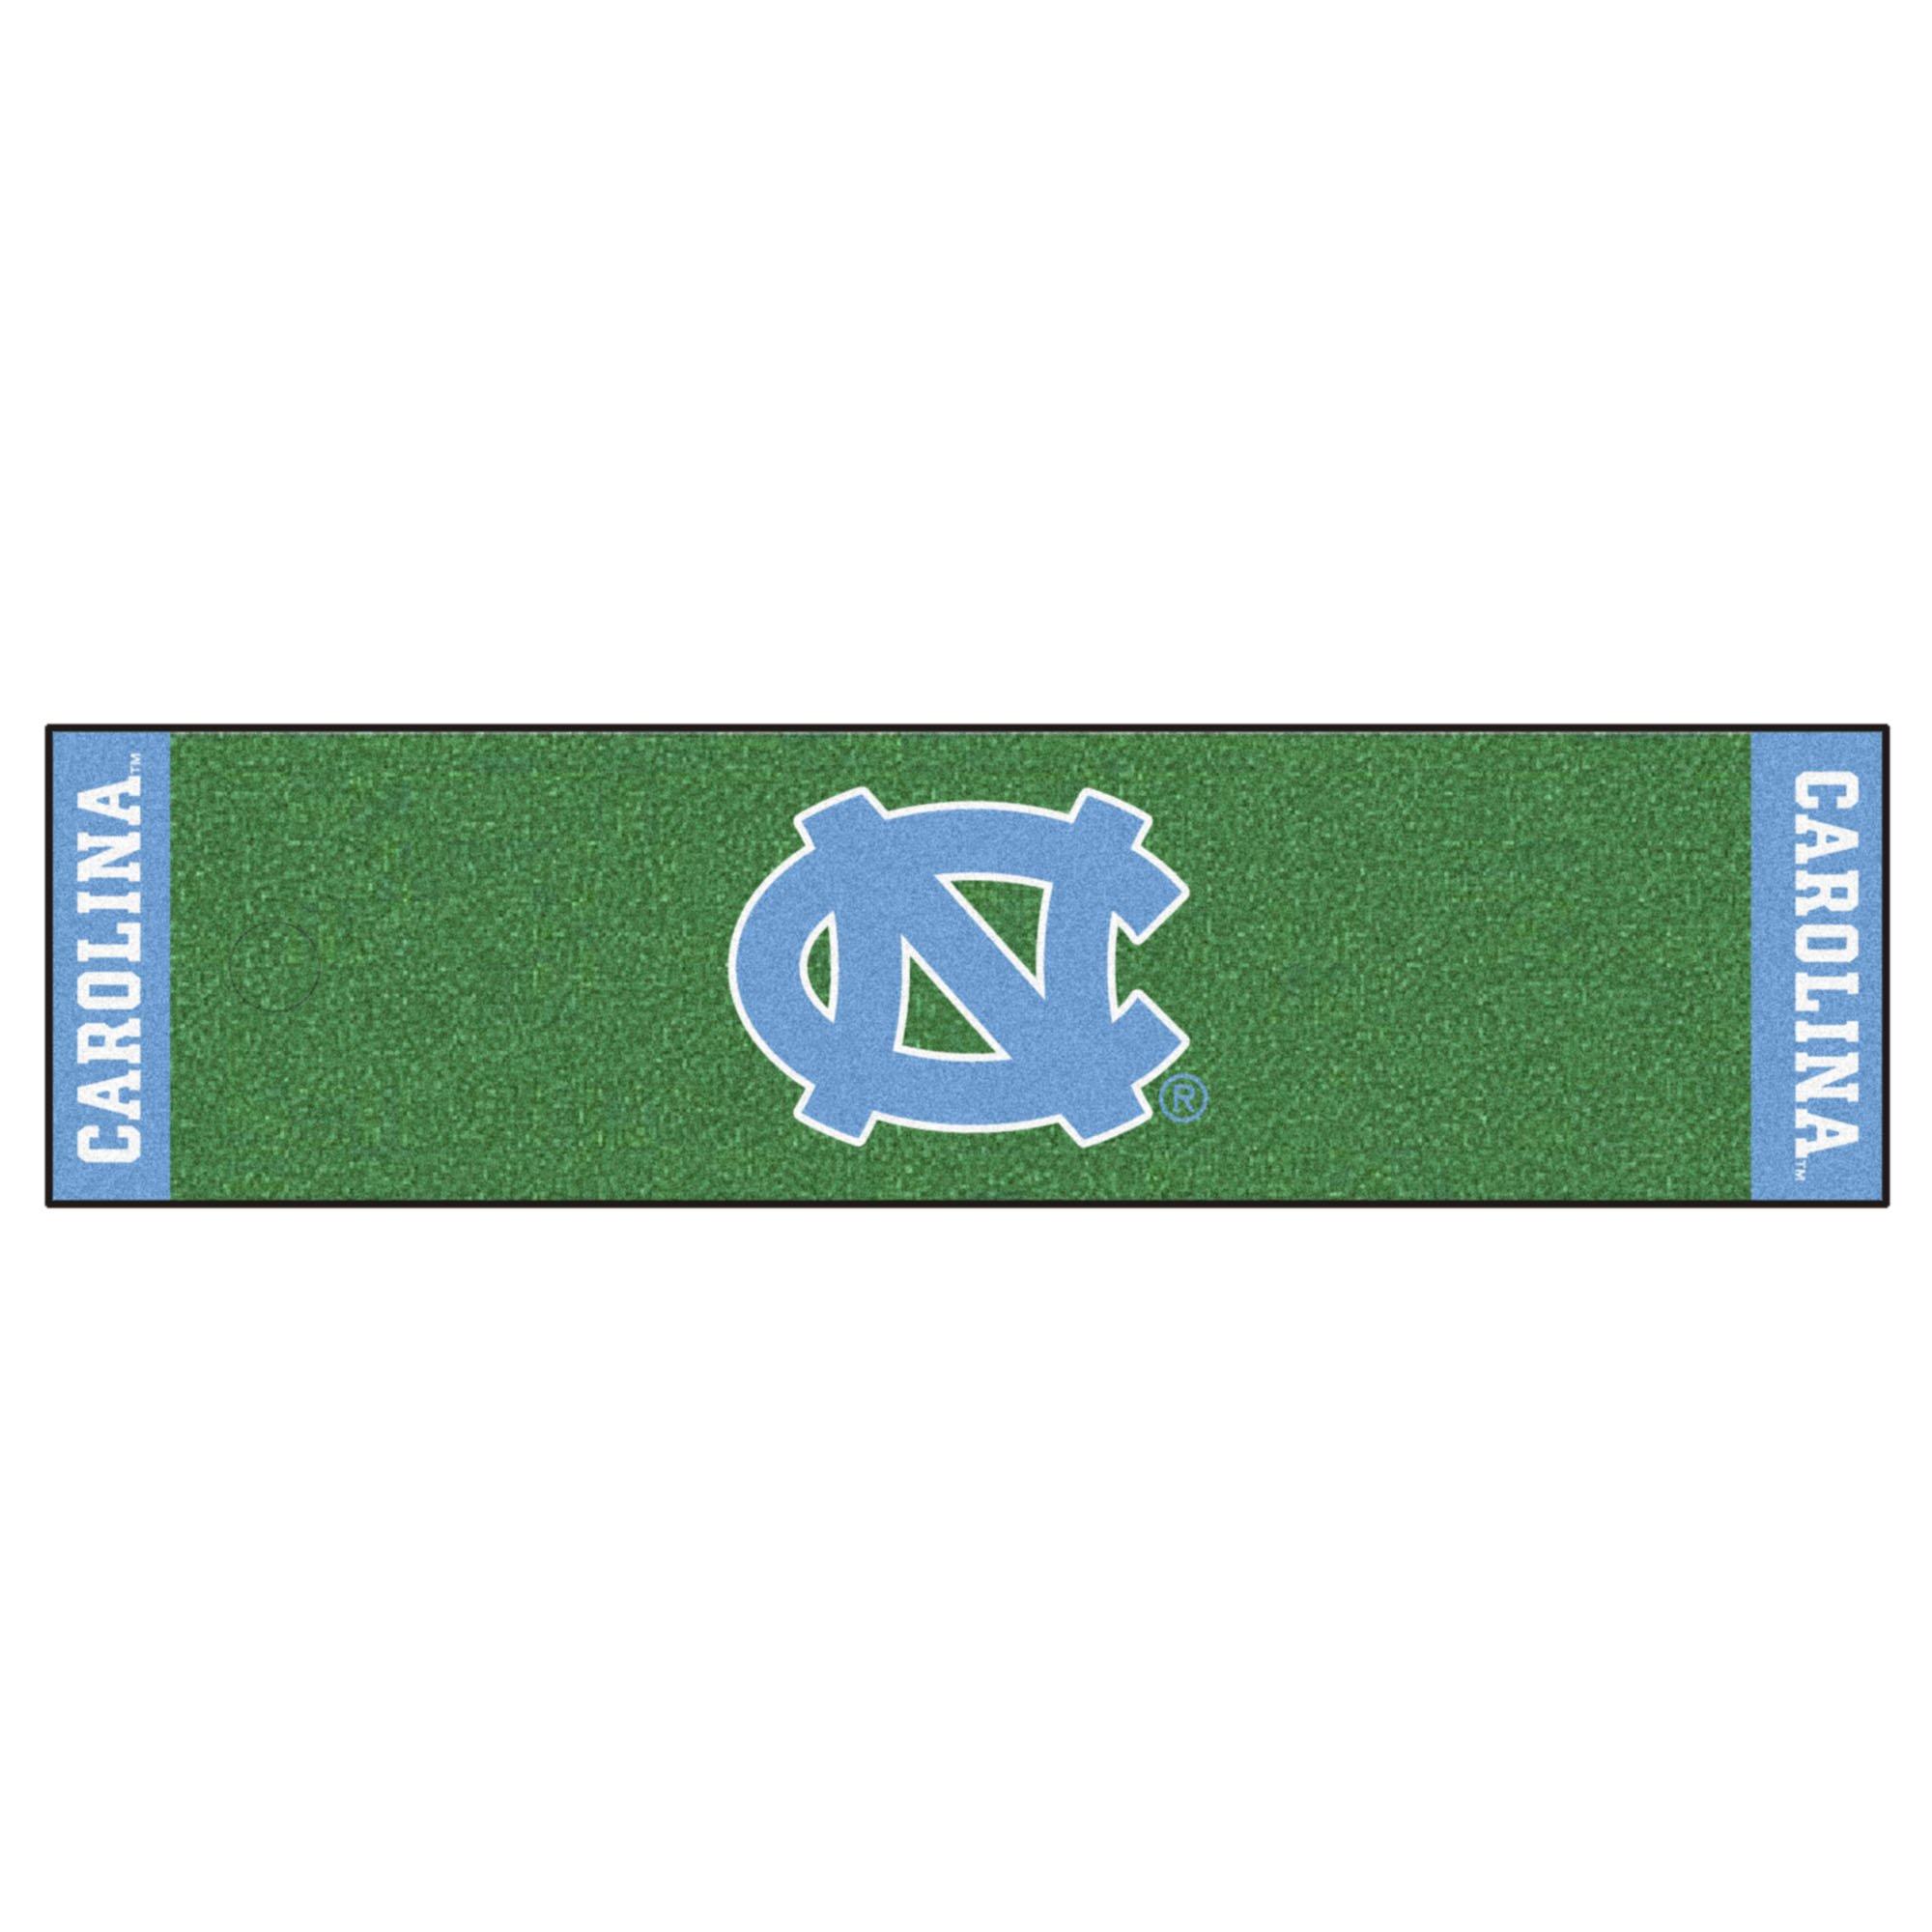 NCAA University of North Carolina - Chapel Hill Tar Heels Putting Green Mat Golf Accessory